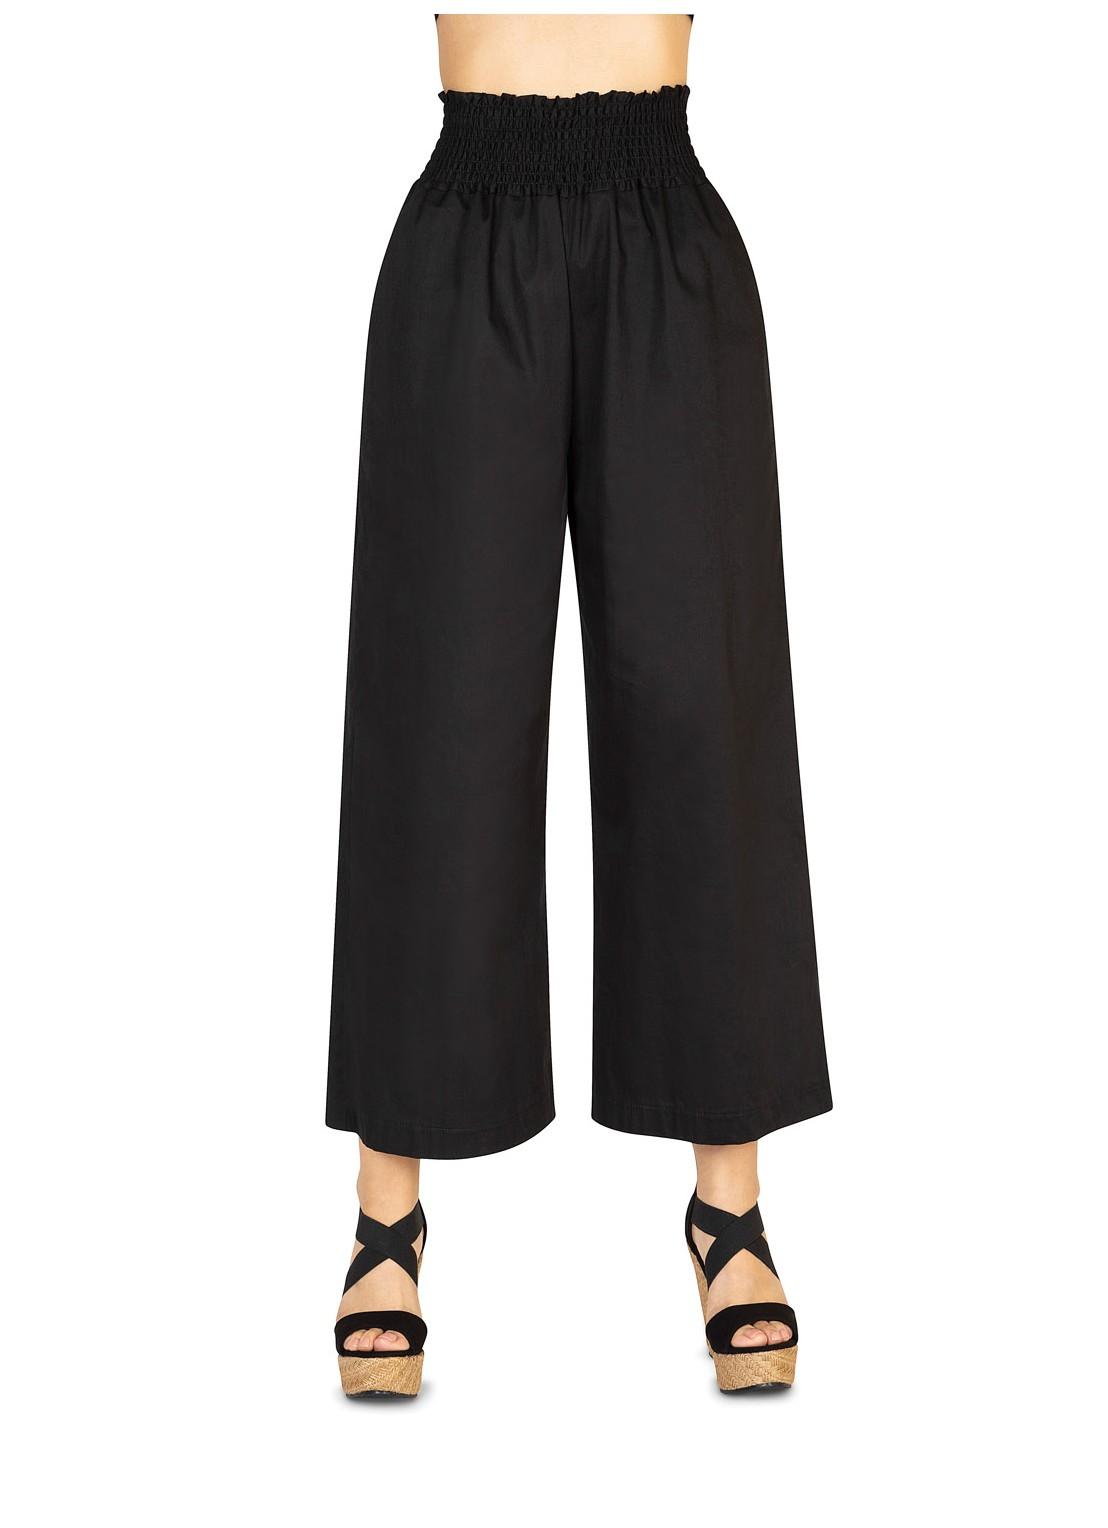 Pantalón flare negro